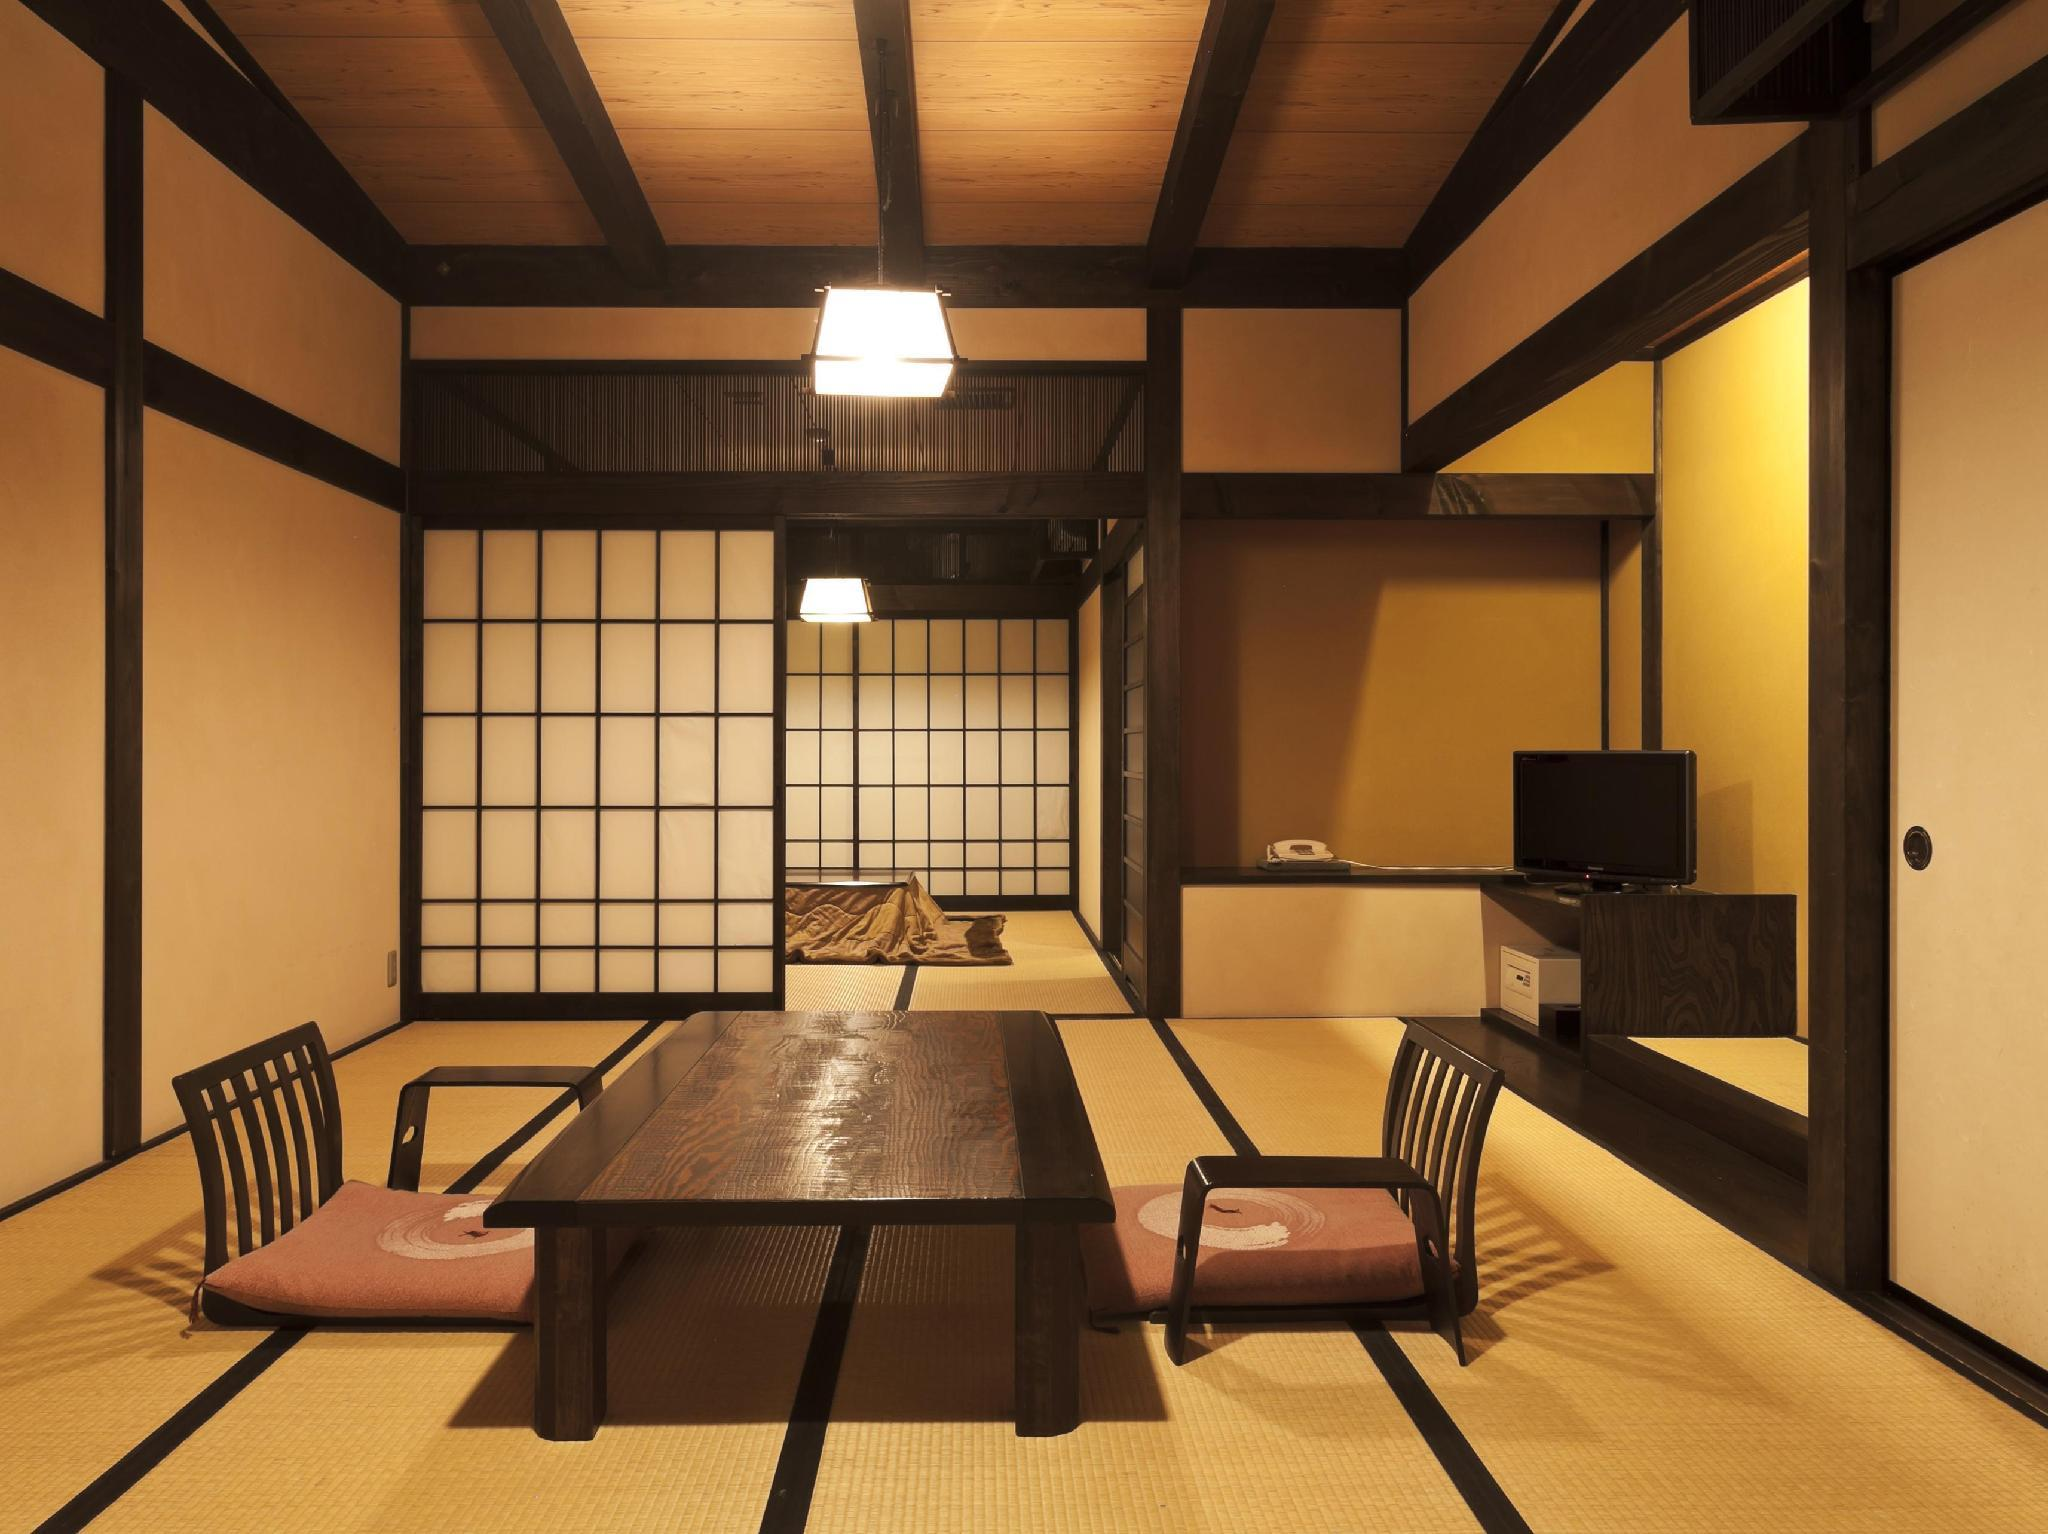 Vasca Da Bagno Stile Giapponese : Okada ryokan takayama affari imbattibili su agoda.com